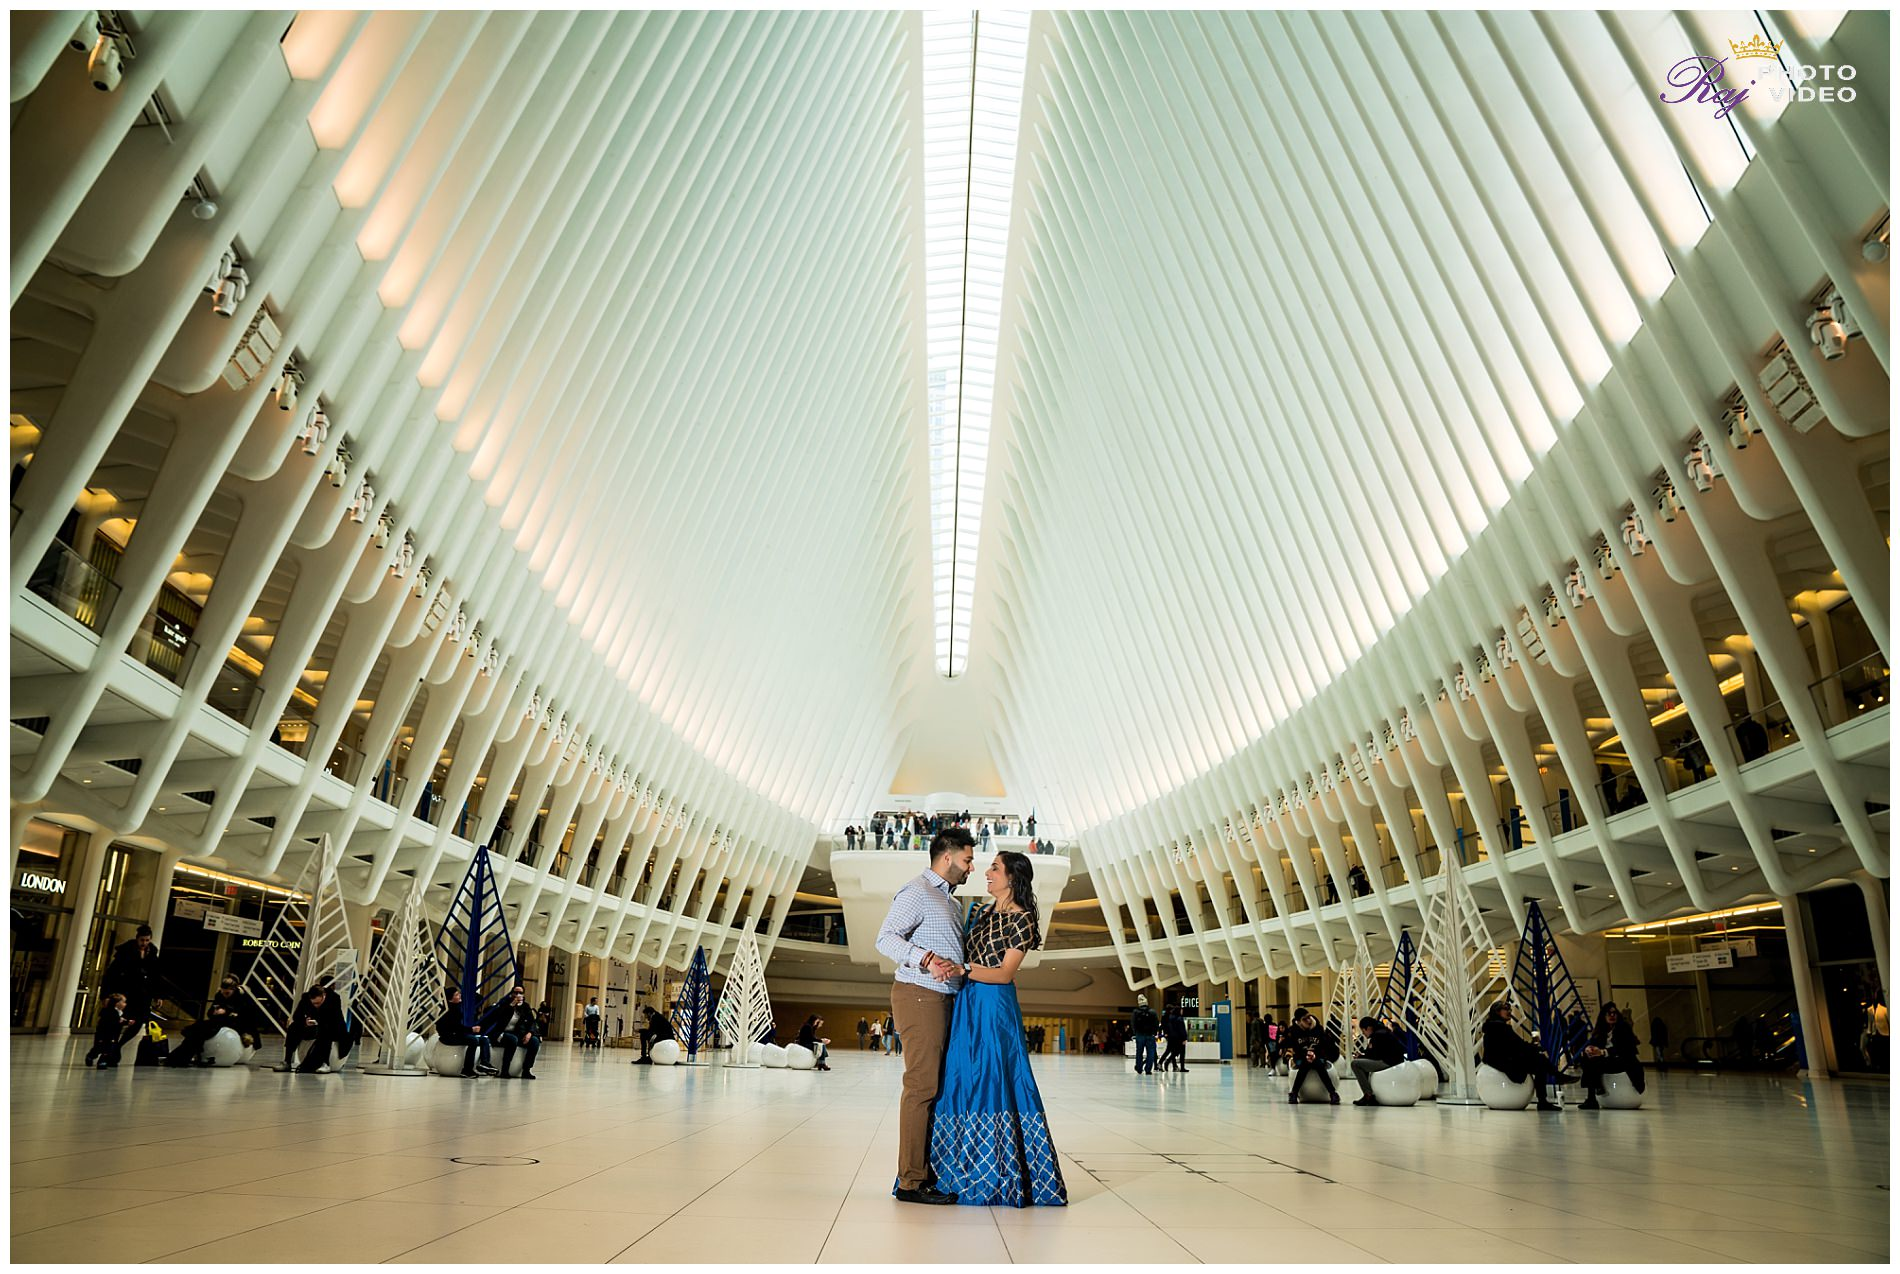 The-Oculus-Brookfield-Place-Downtown-Manhattan-Engagement-Shoot-Nidhi-Rudra-00005.jpg